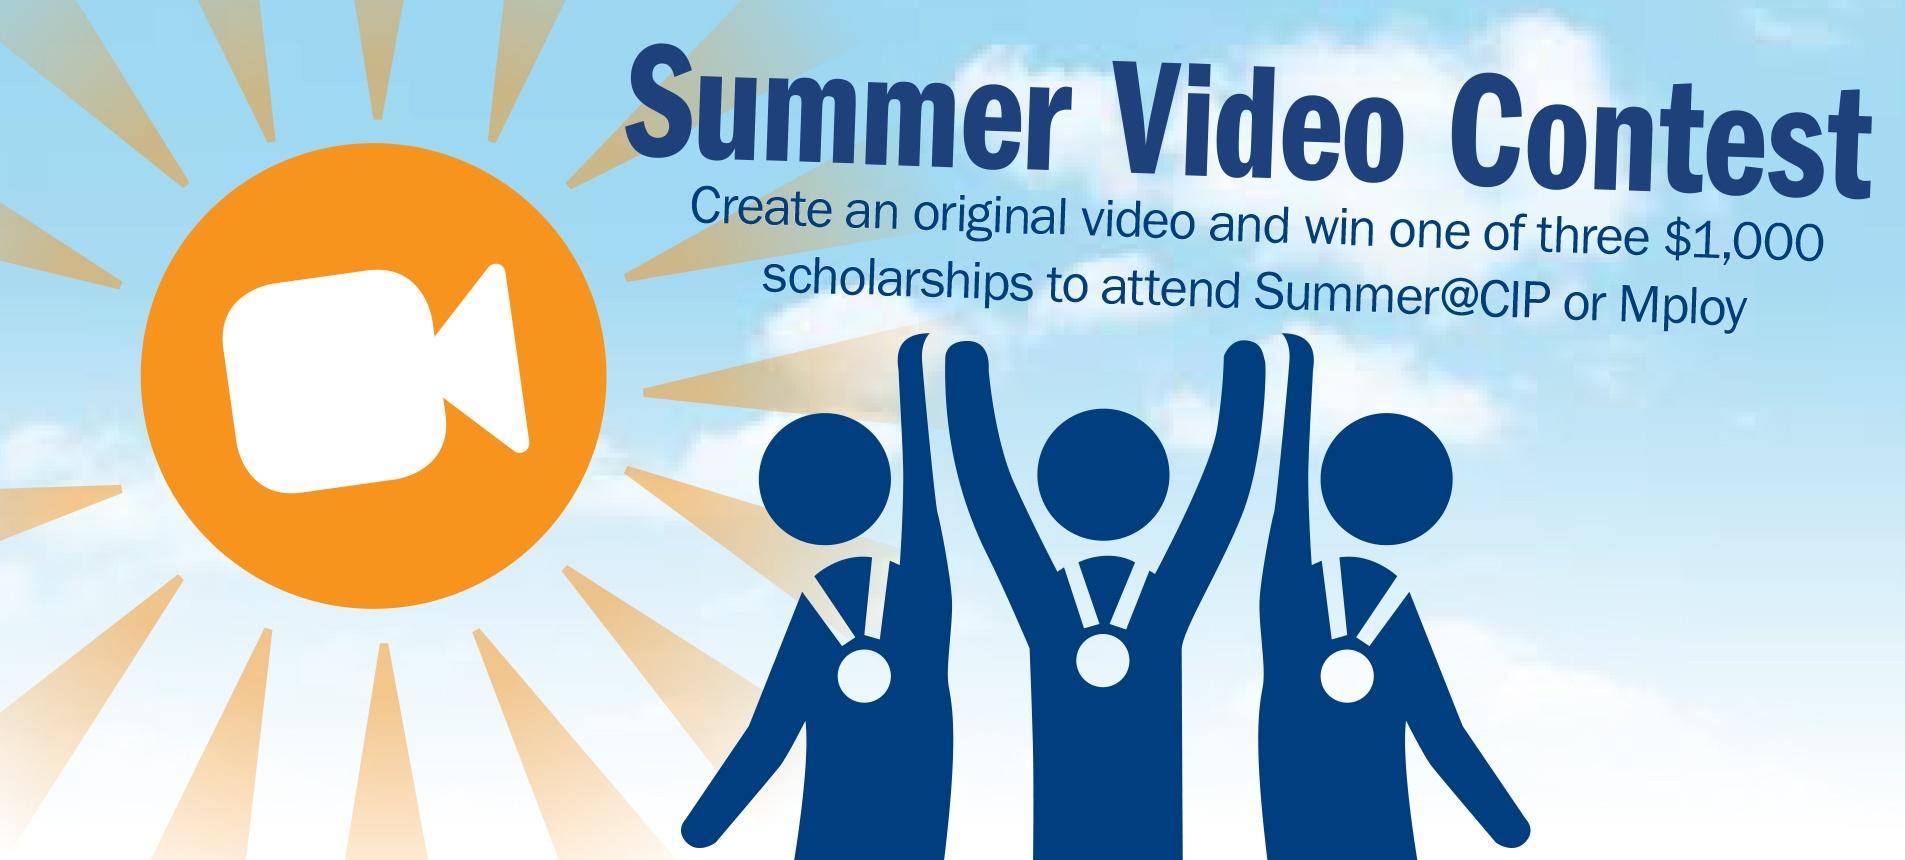 Summer Video Contest